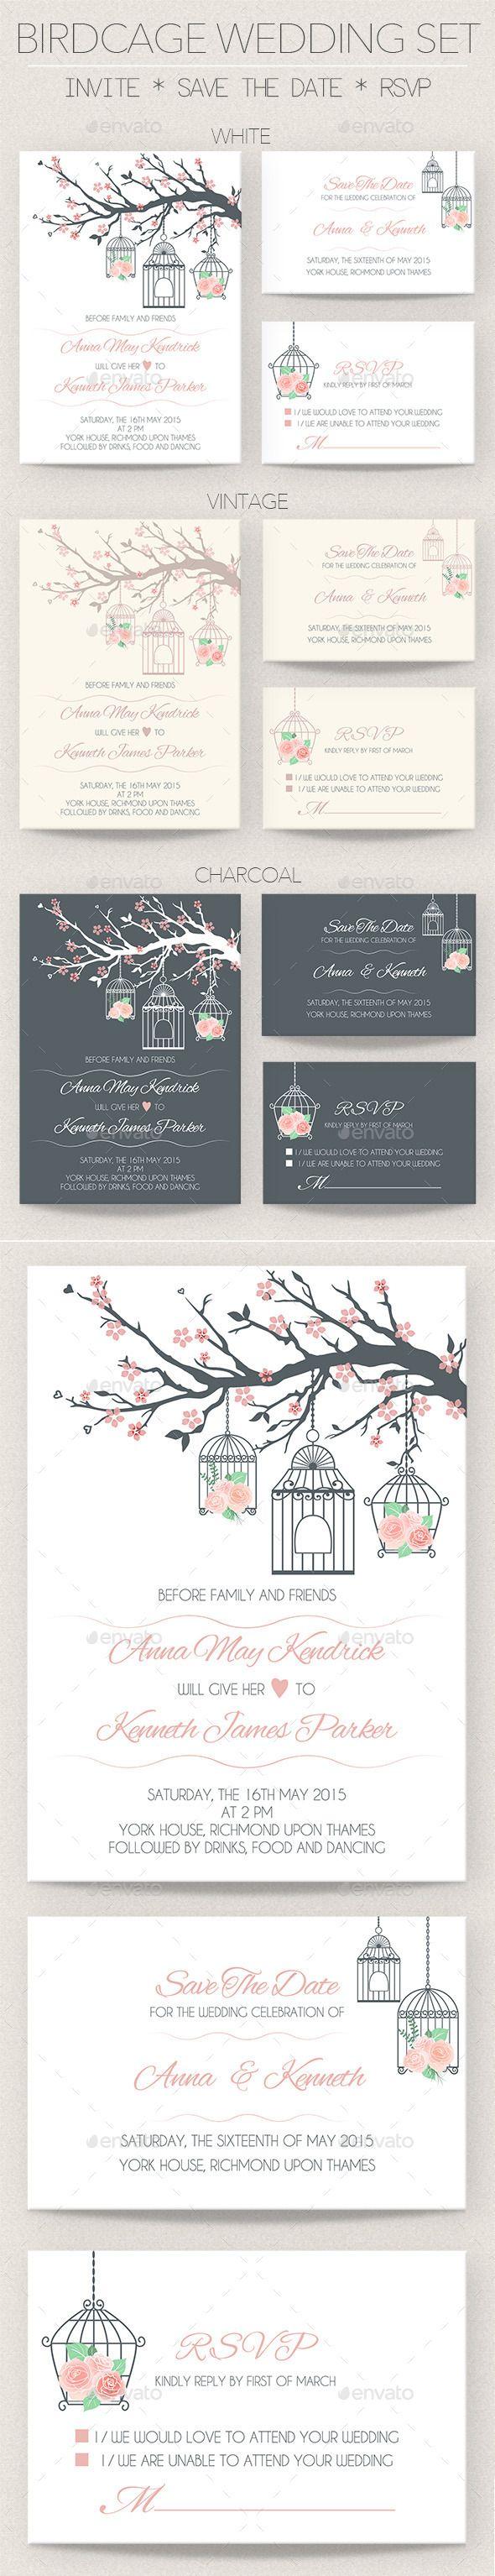 Birdcage Wedding Invitation Set | Wedding invitation sets, Wedding ...